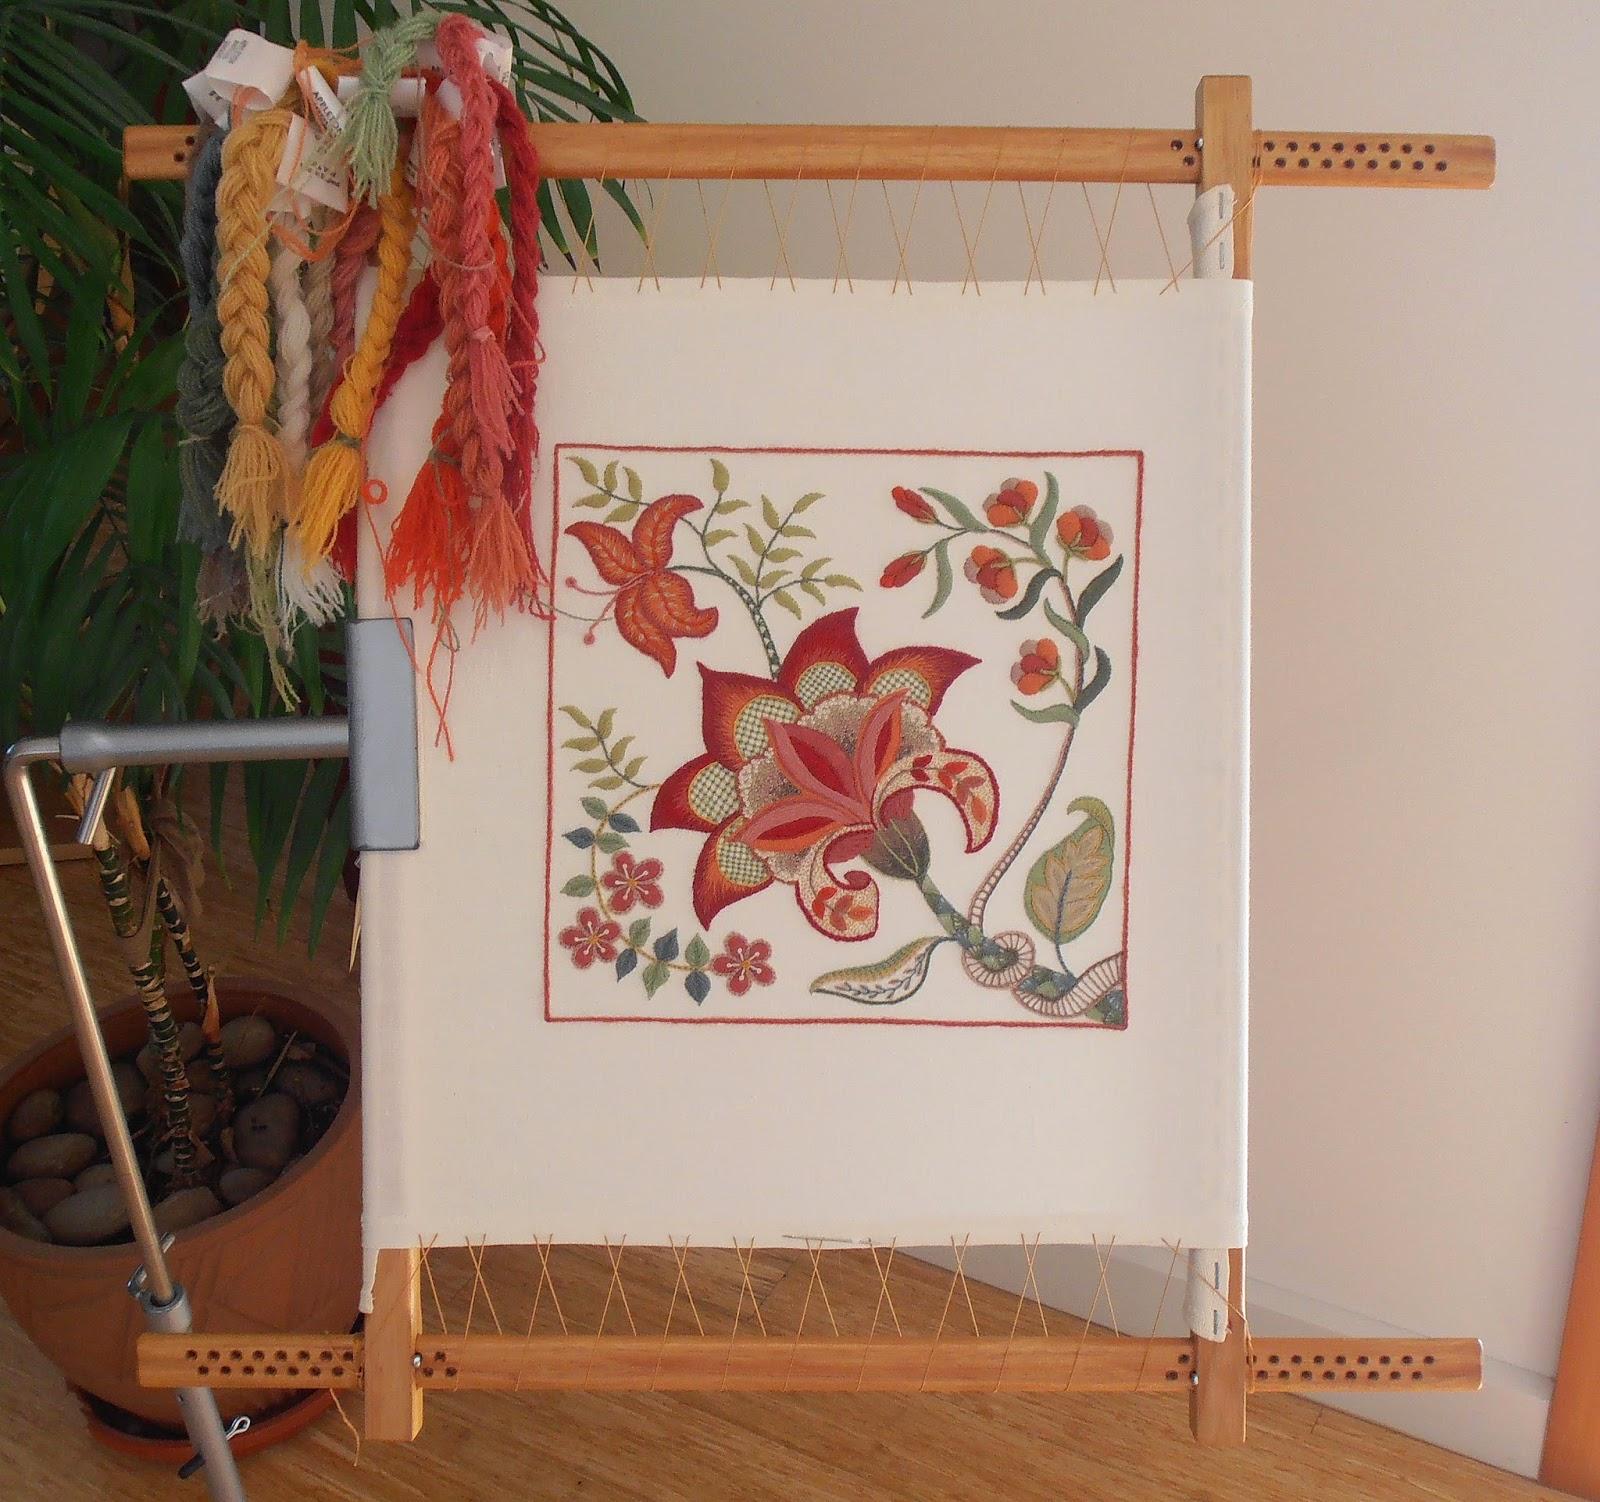 Anna Scott : Crewel embroidery update...